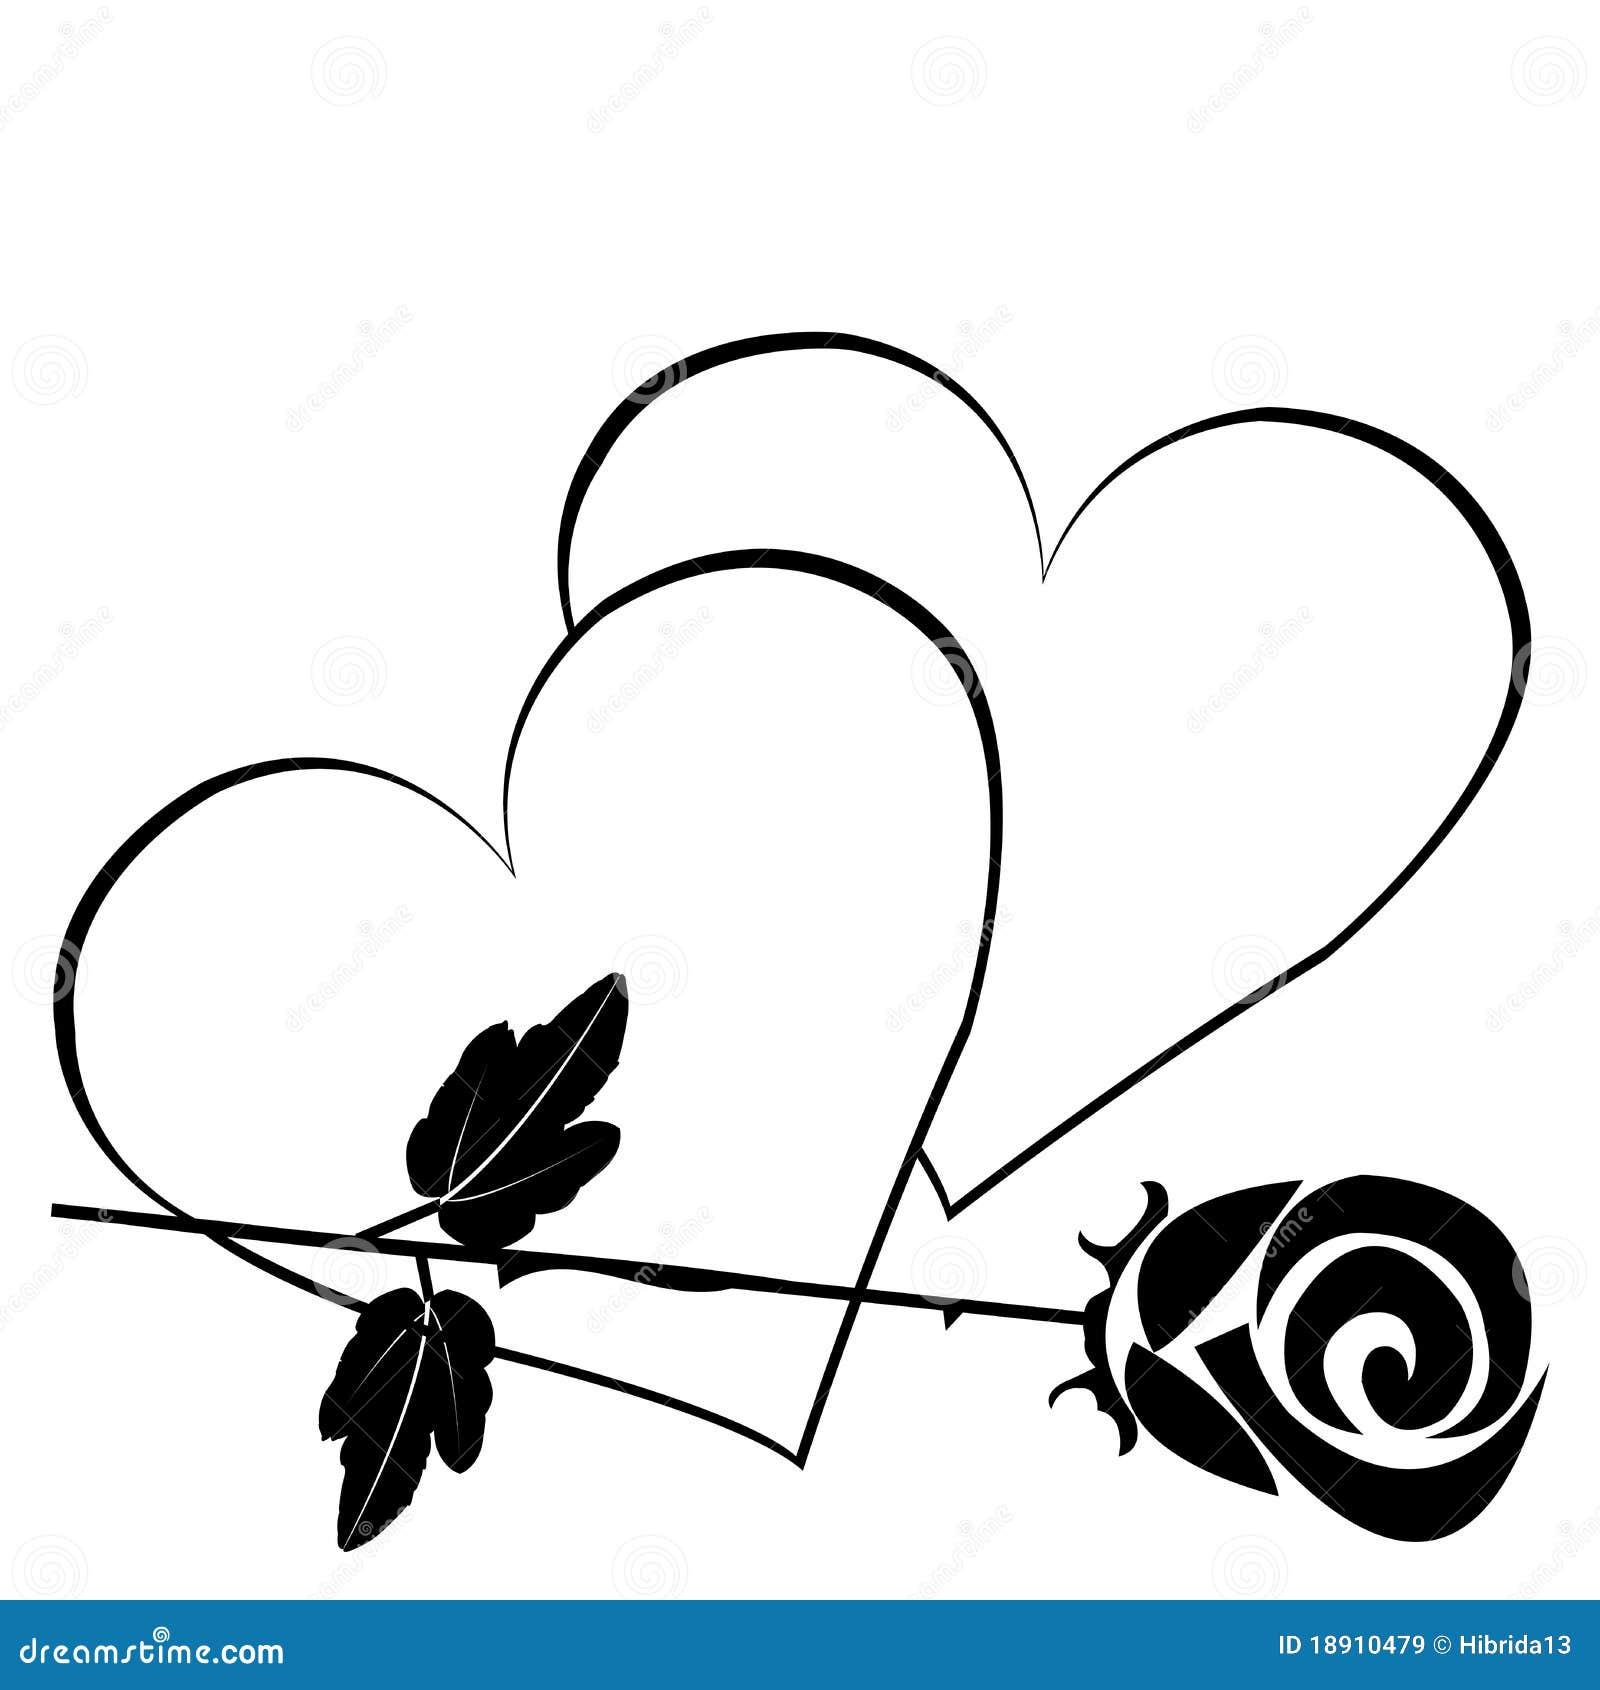 Black hearts with rose stock illustration. Illustration of ...